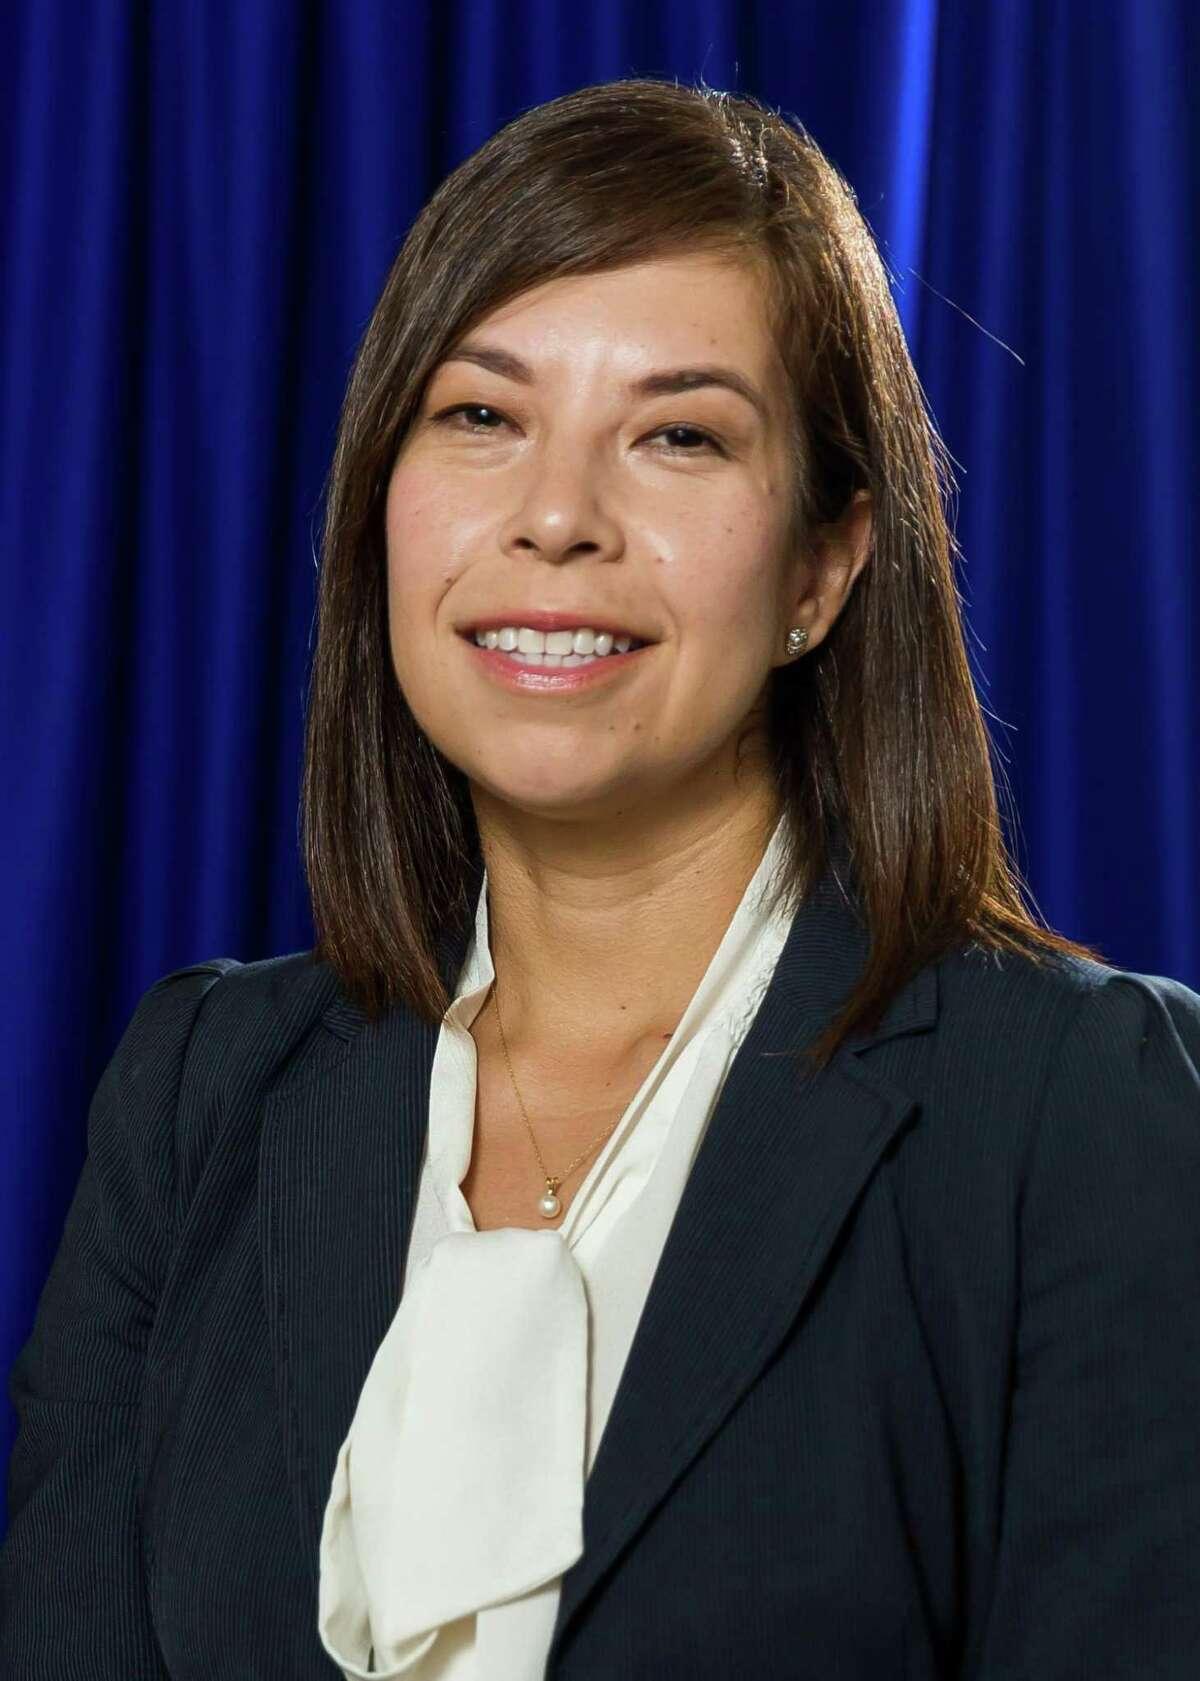 San Antonio lawyer Christine Hortick is the Democratic nominee for Precinct 3 Bexar County commissioner.